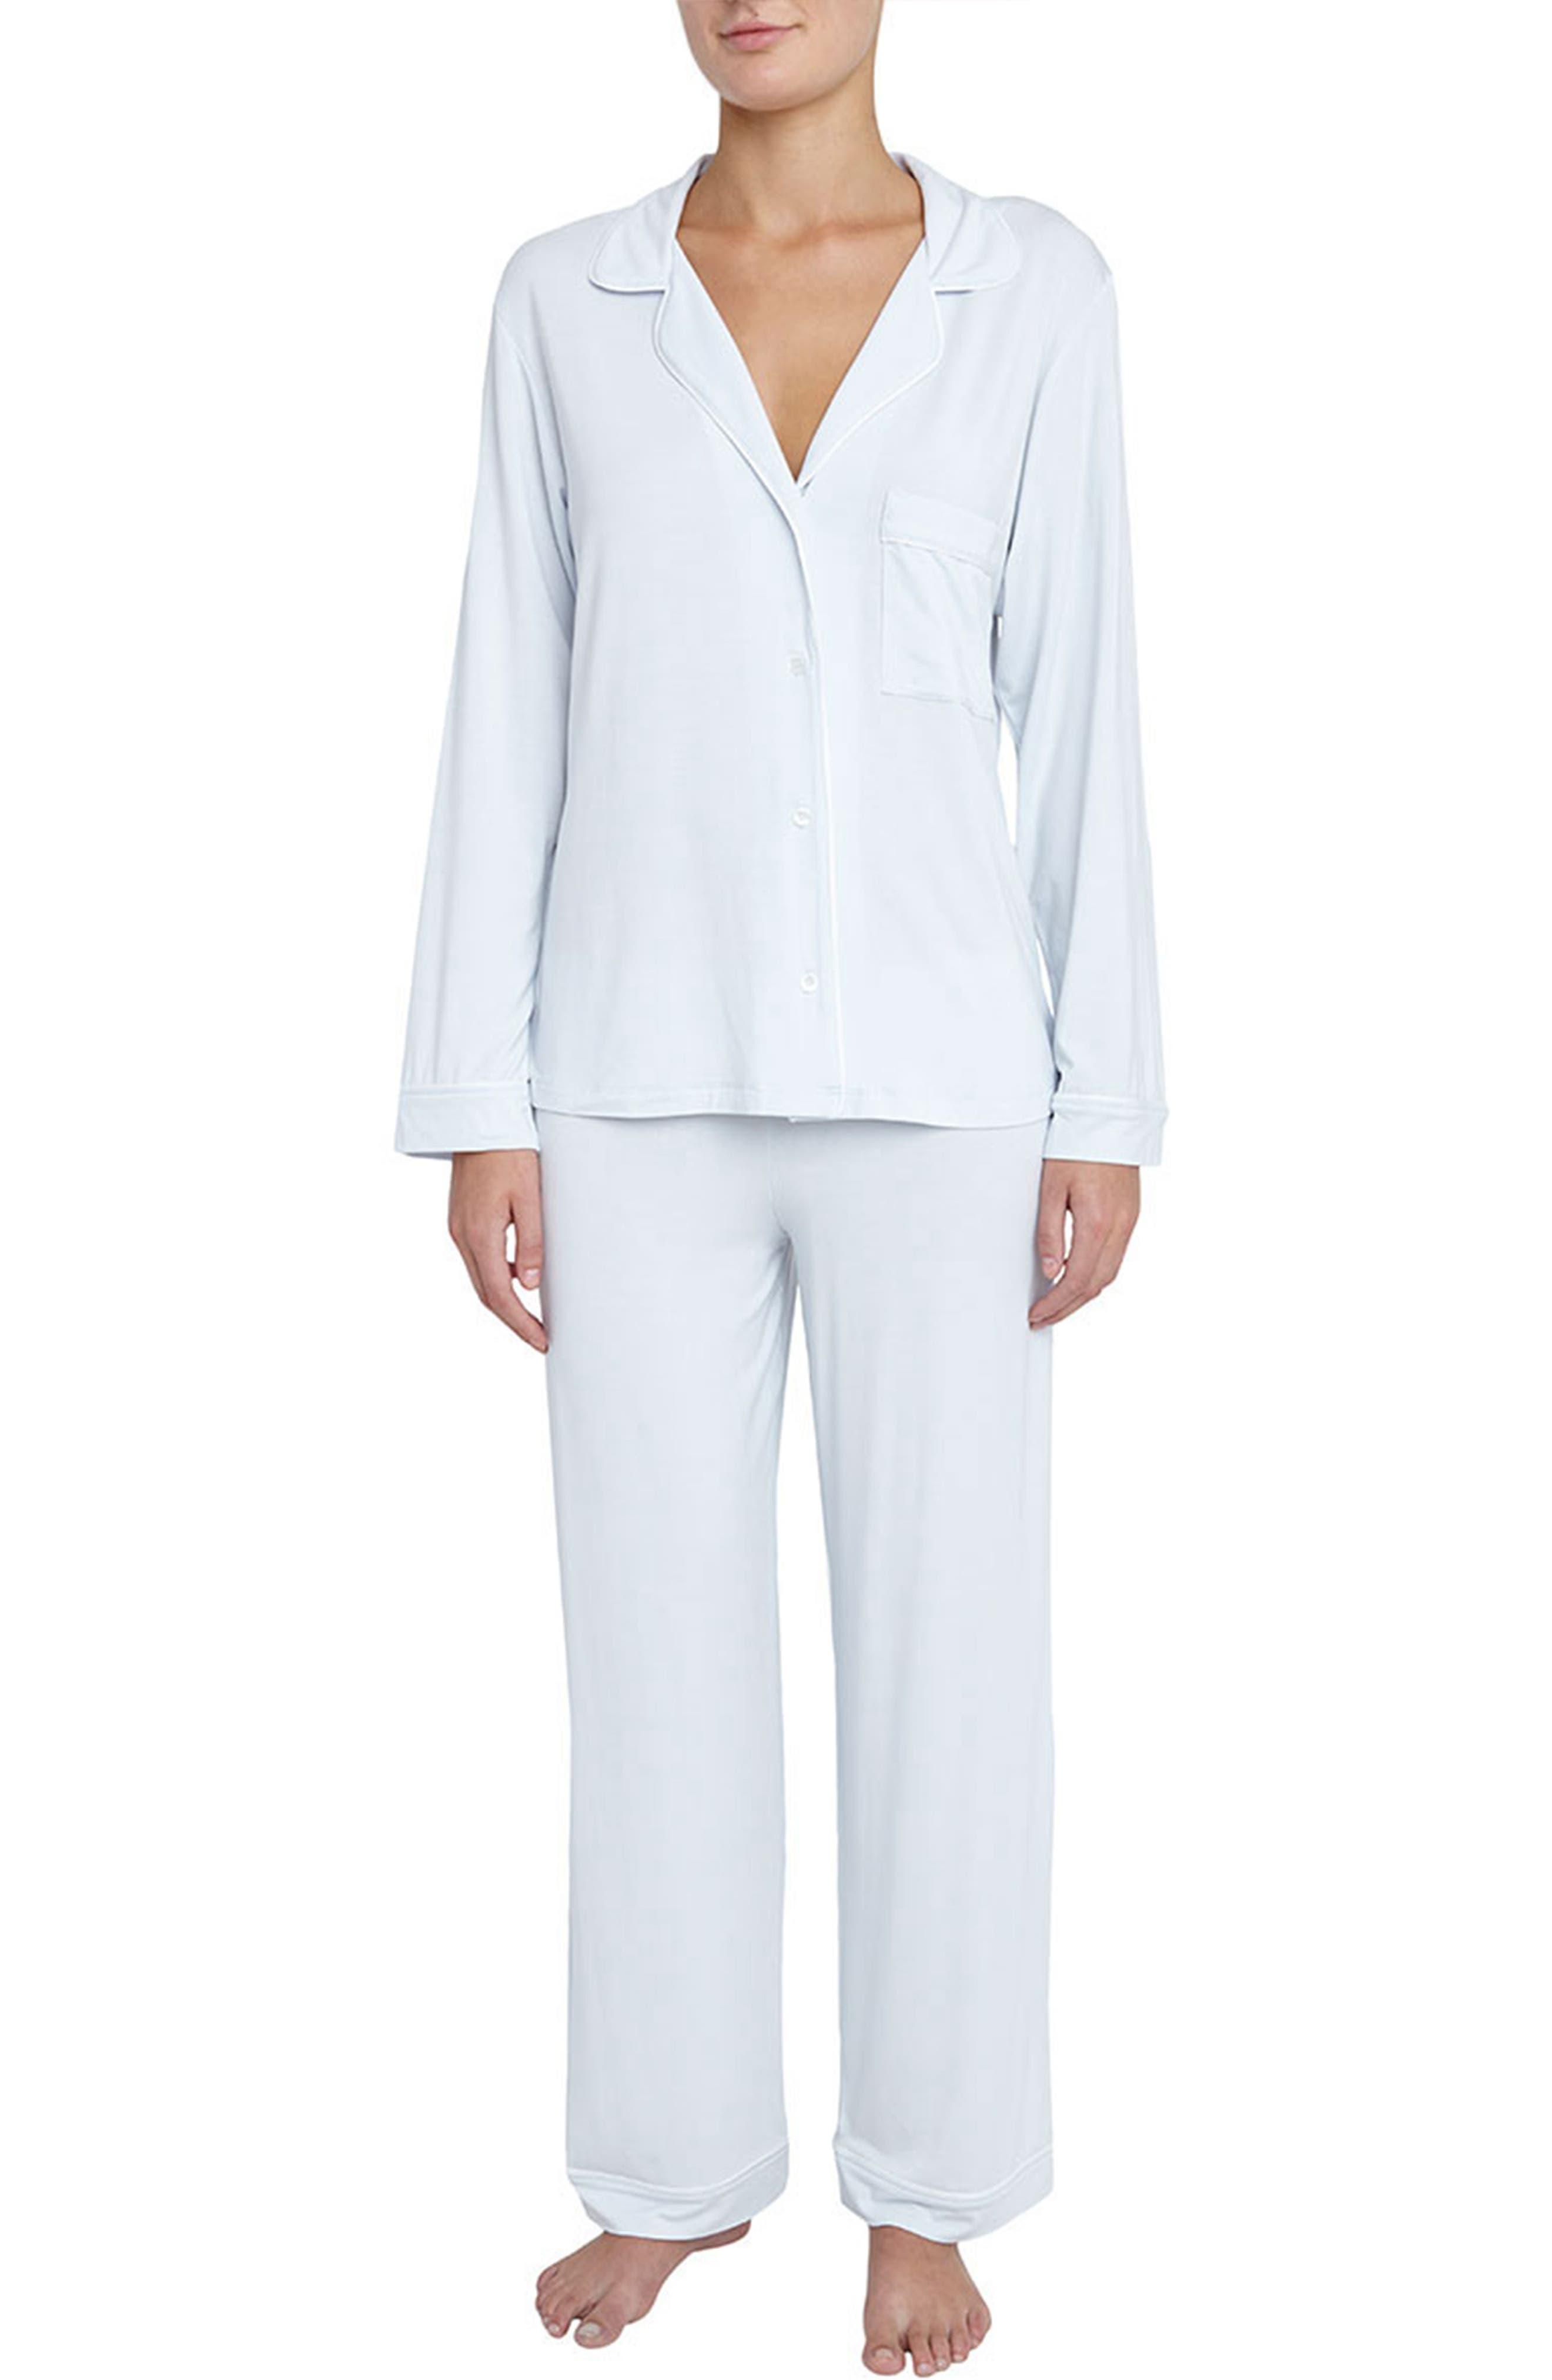 Eberjey 'Giselle' Pajamas